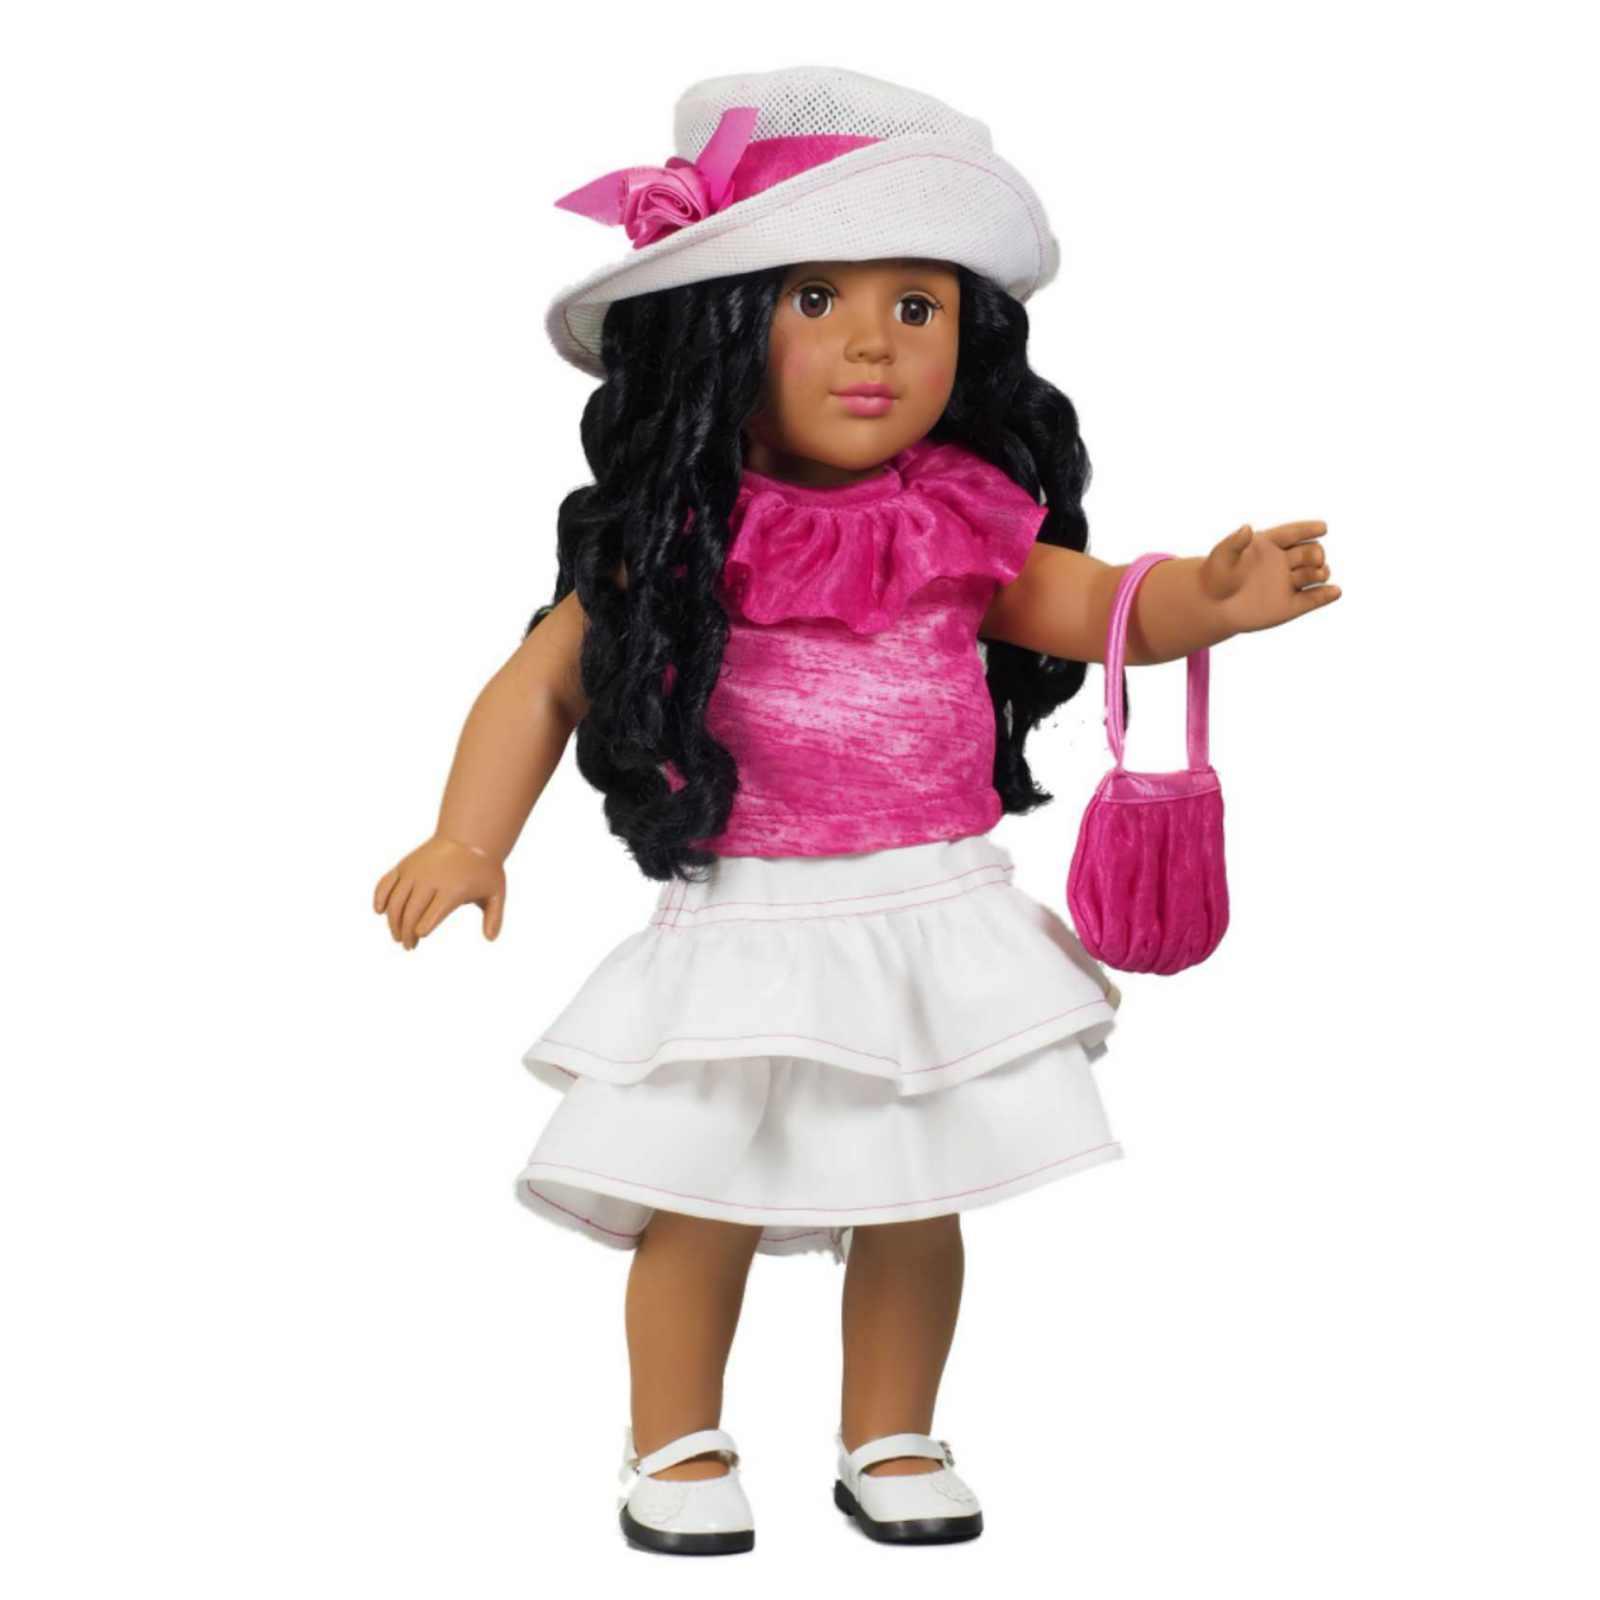 The Queens Treasures Hot Pink Skirt Set Fits 18